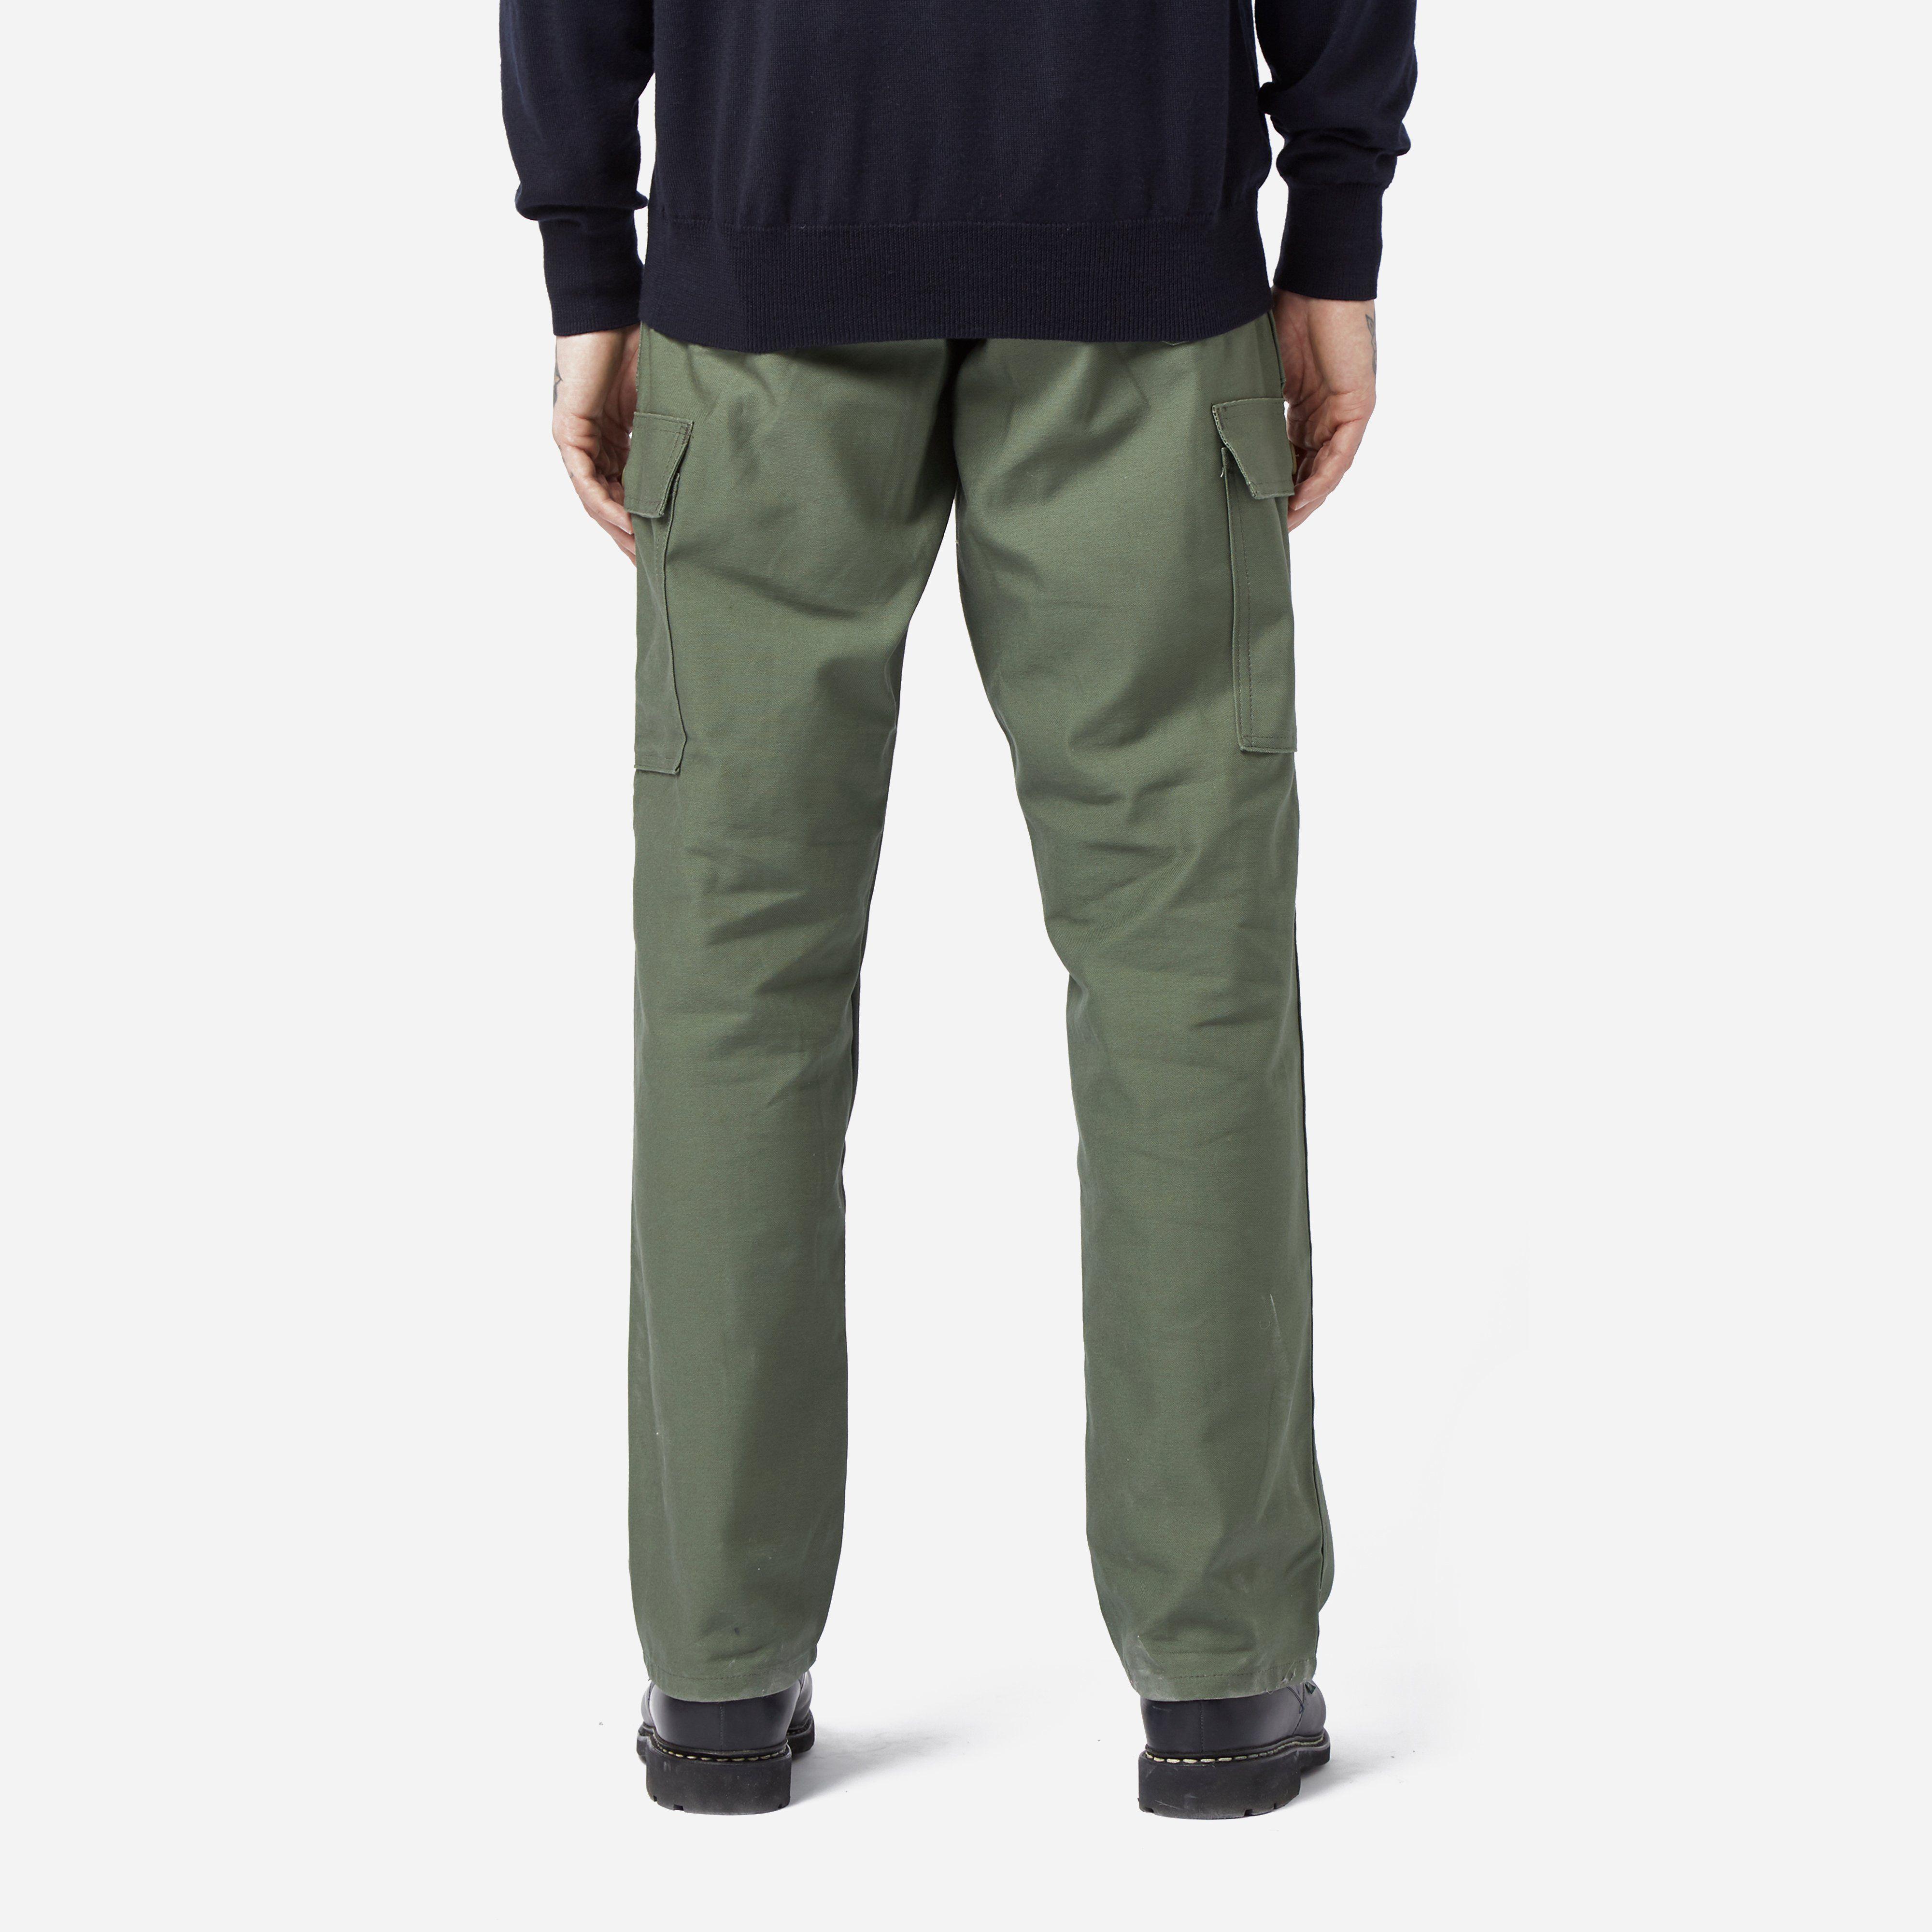 Stan Ray 1900 6 Pocket Cargo Chino Pant